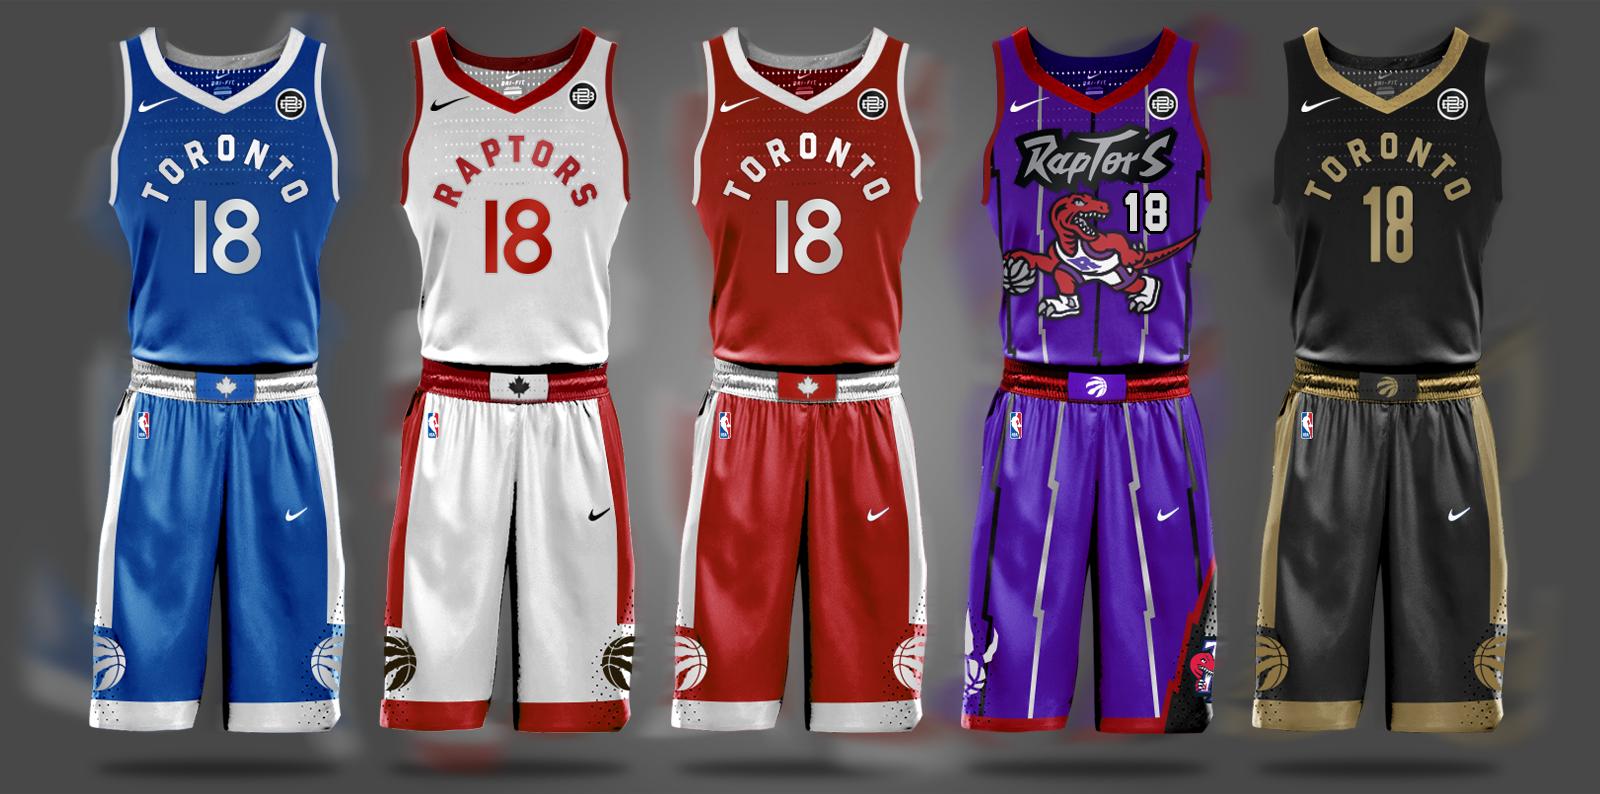 No autorizado Negociar autobús  NBA Nike Uniform Concepts - I Am Brian Begley